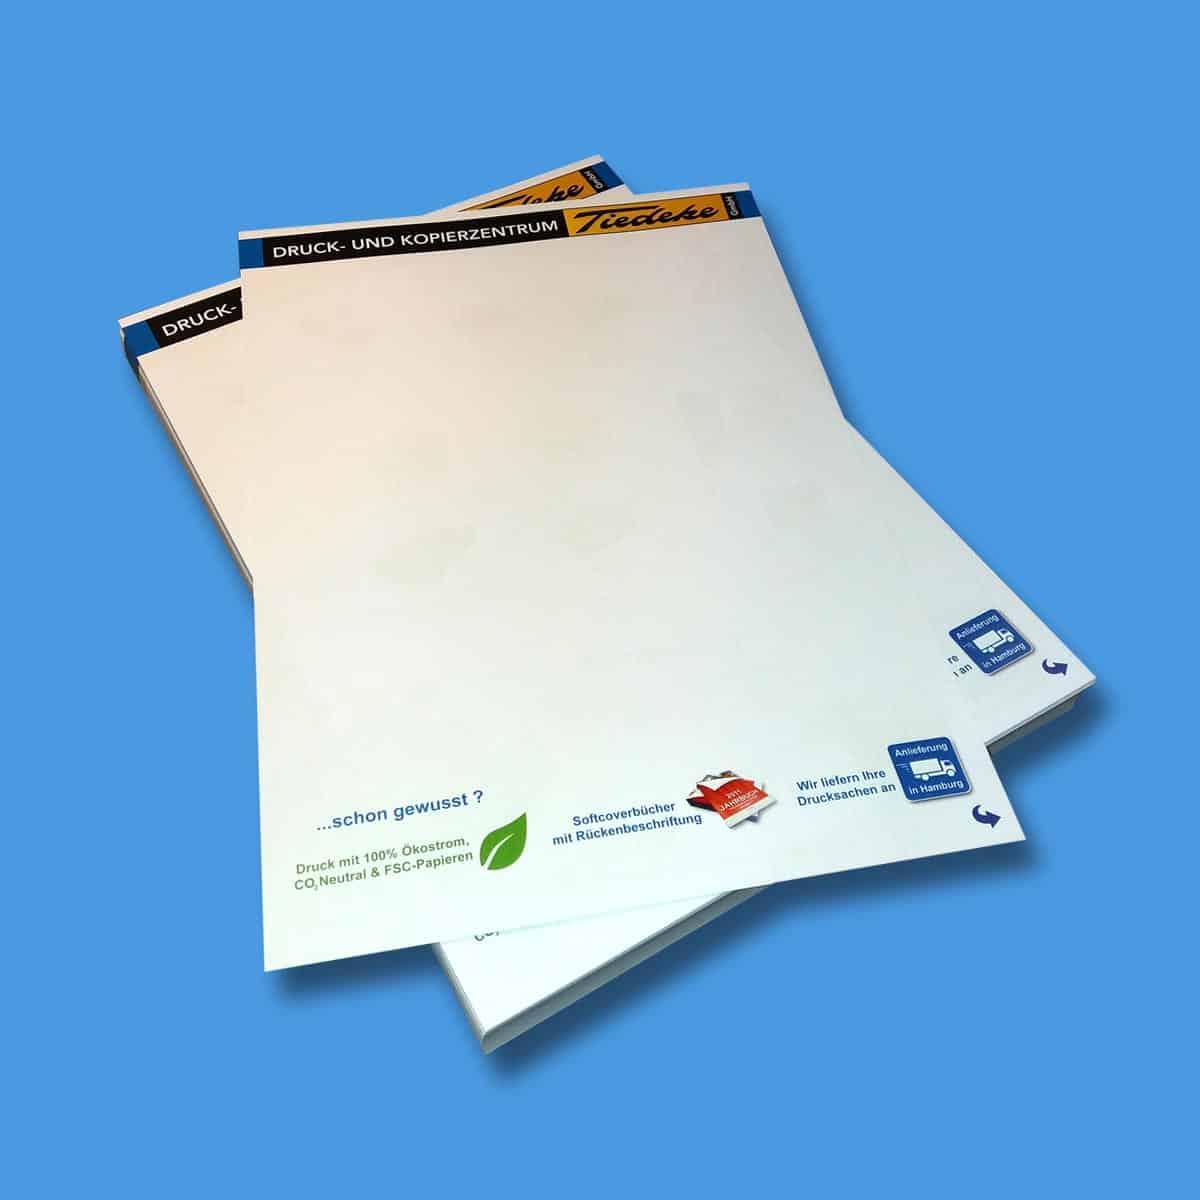 papiergewicht berechnen was wiegt z b a4 papier www. Black Bedroom Furniture Sets. Home Design Ideas